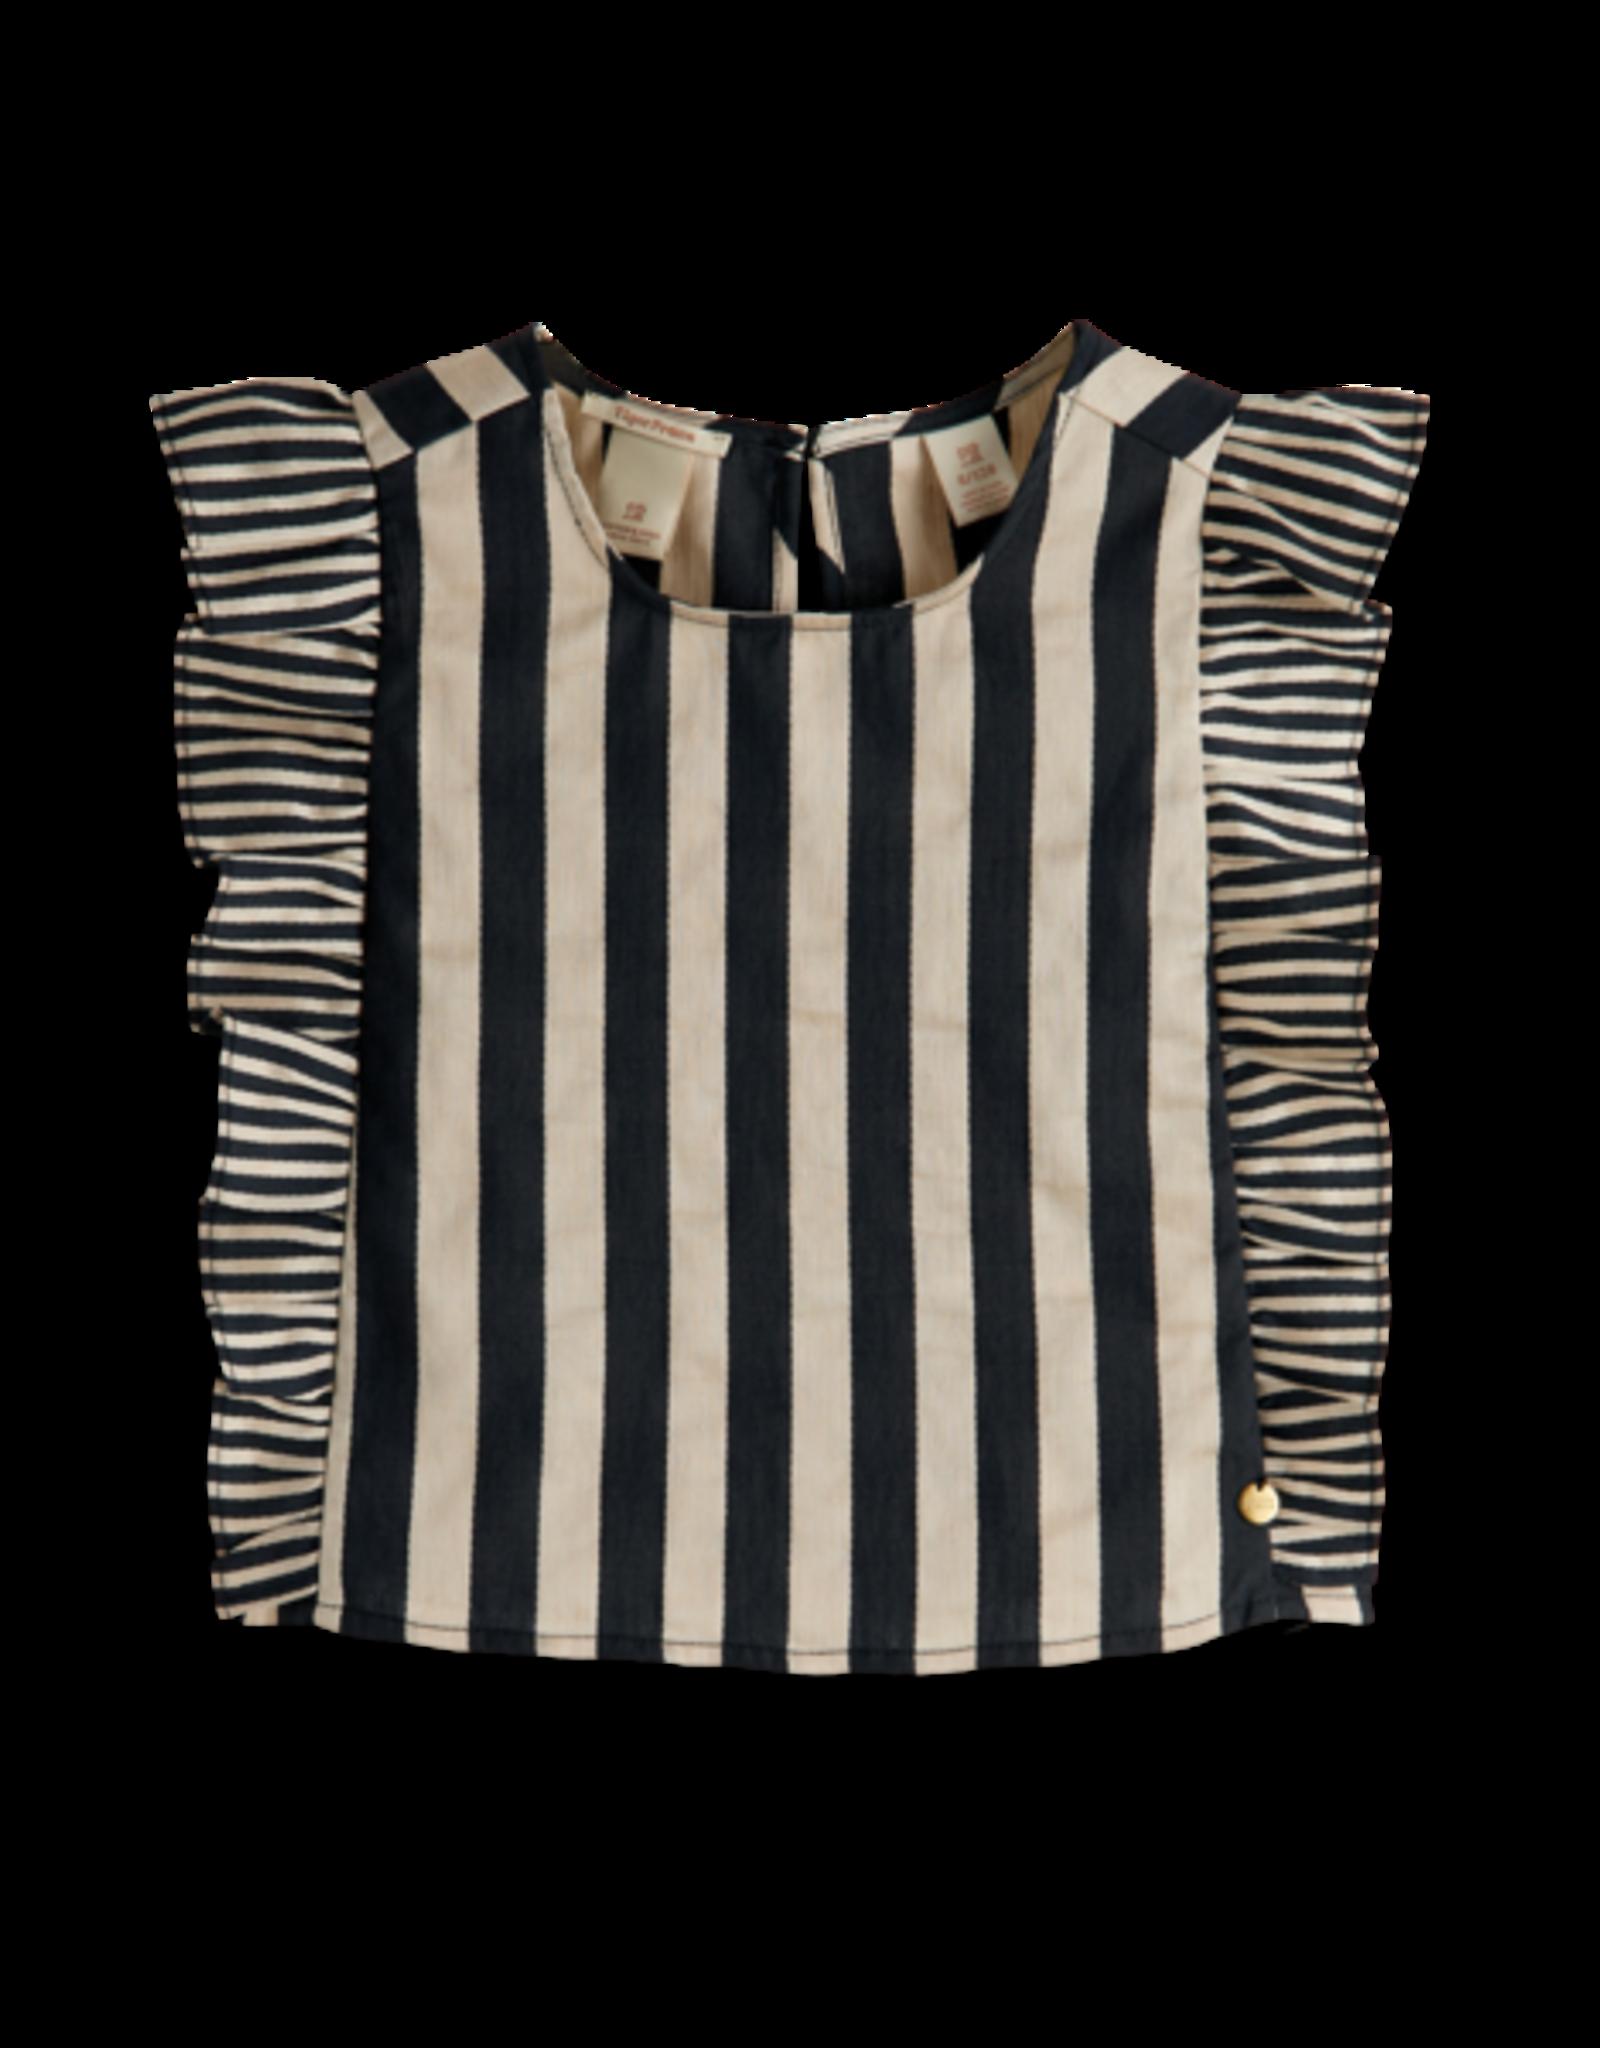 Scotch&Soda R'belle SS21 161337 striped linen top